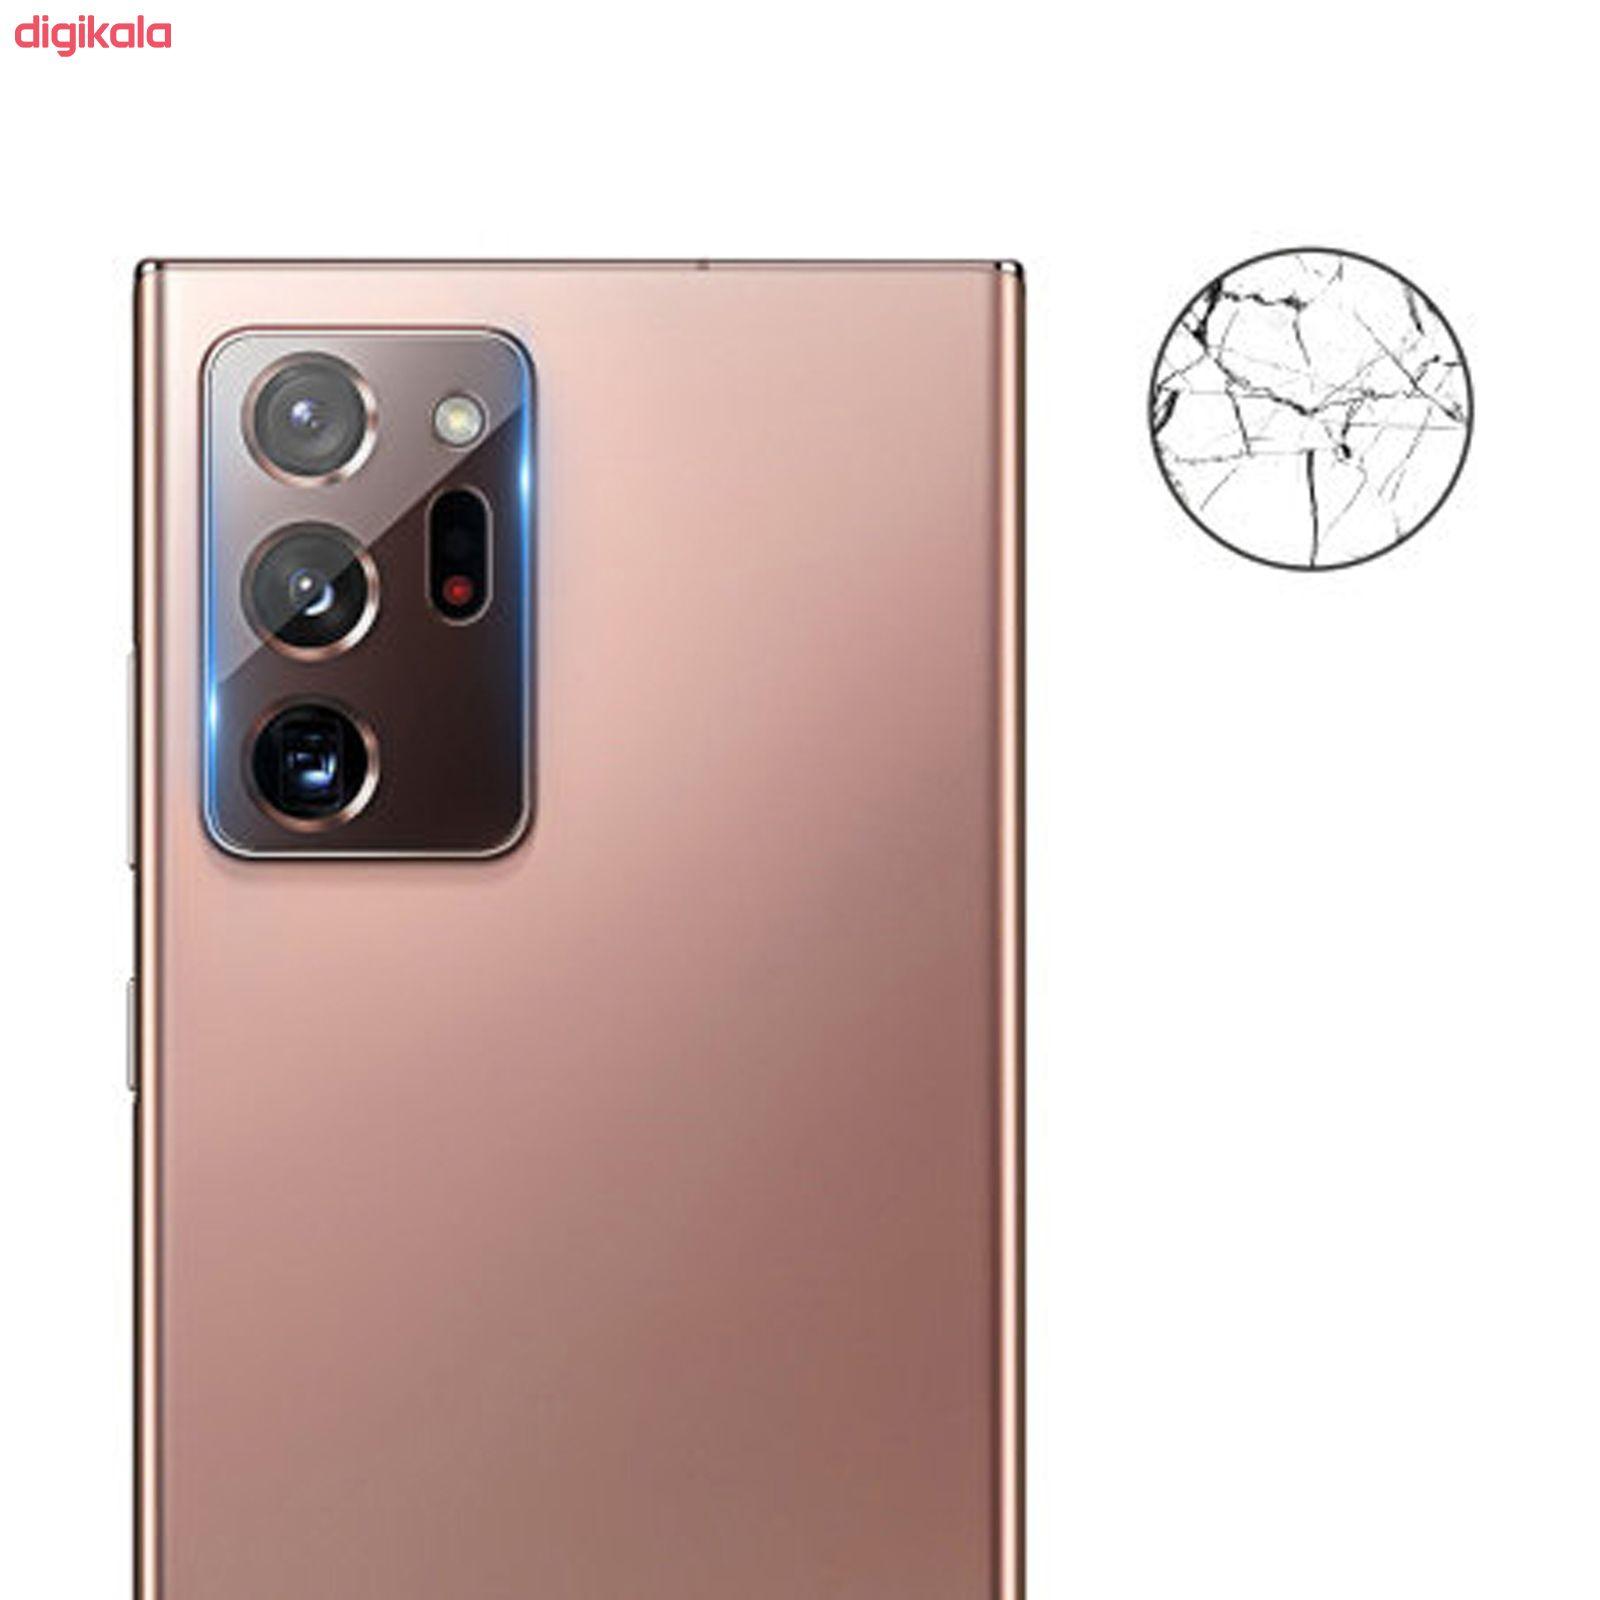 محافظ لنز دوربین سیحان مدل GLP مناسب برای گوشی موبایل سامسونگ Galaxy Note 20 main 1 4